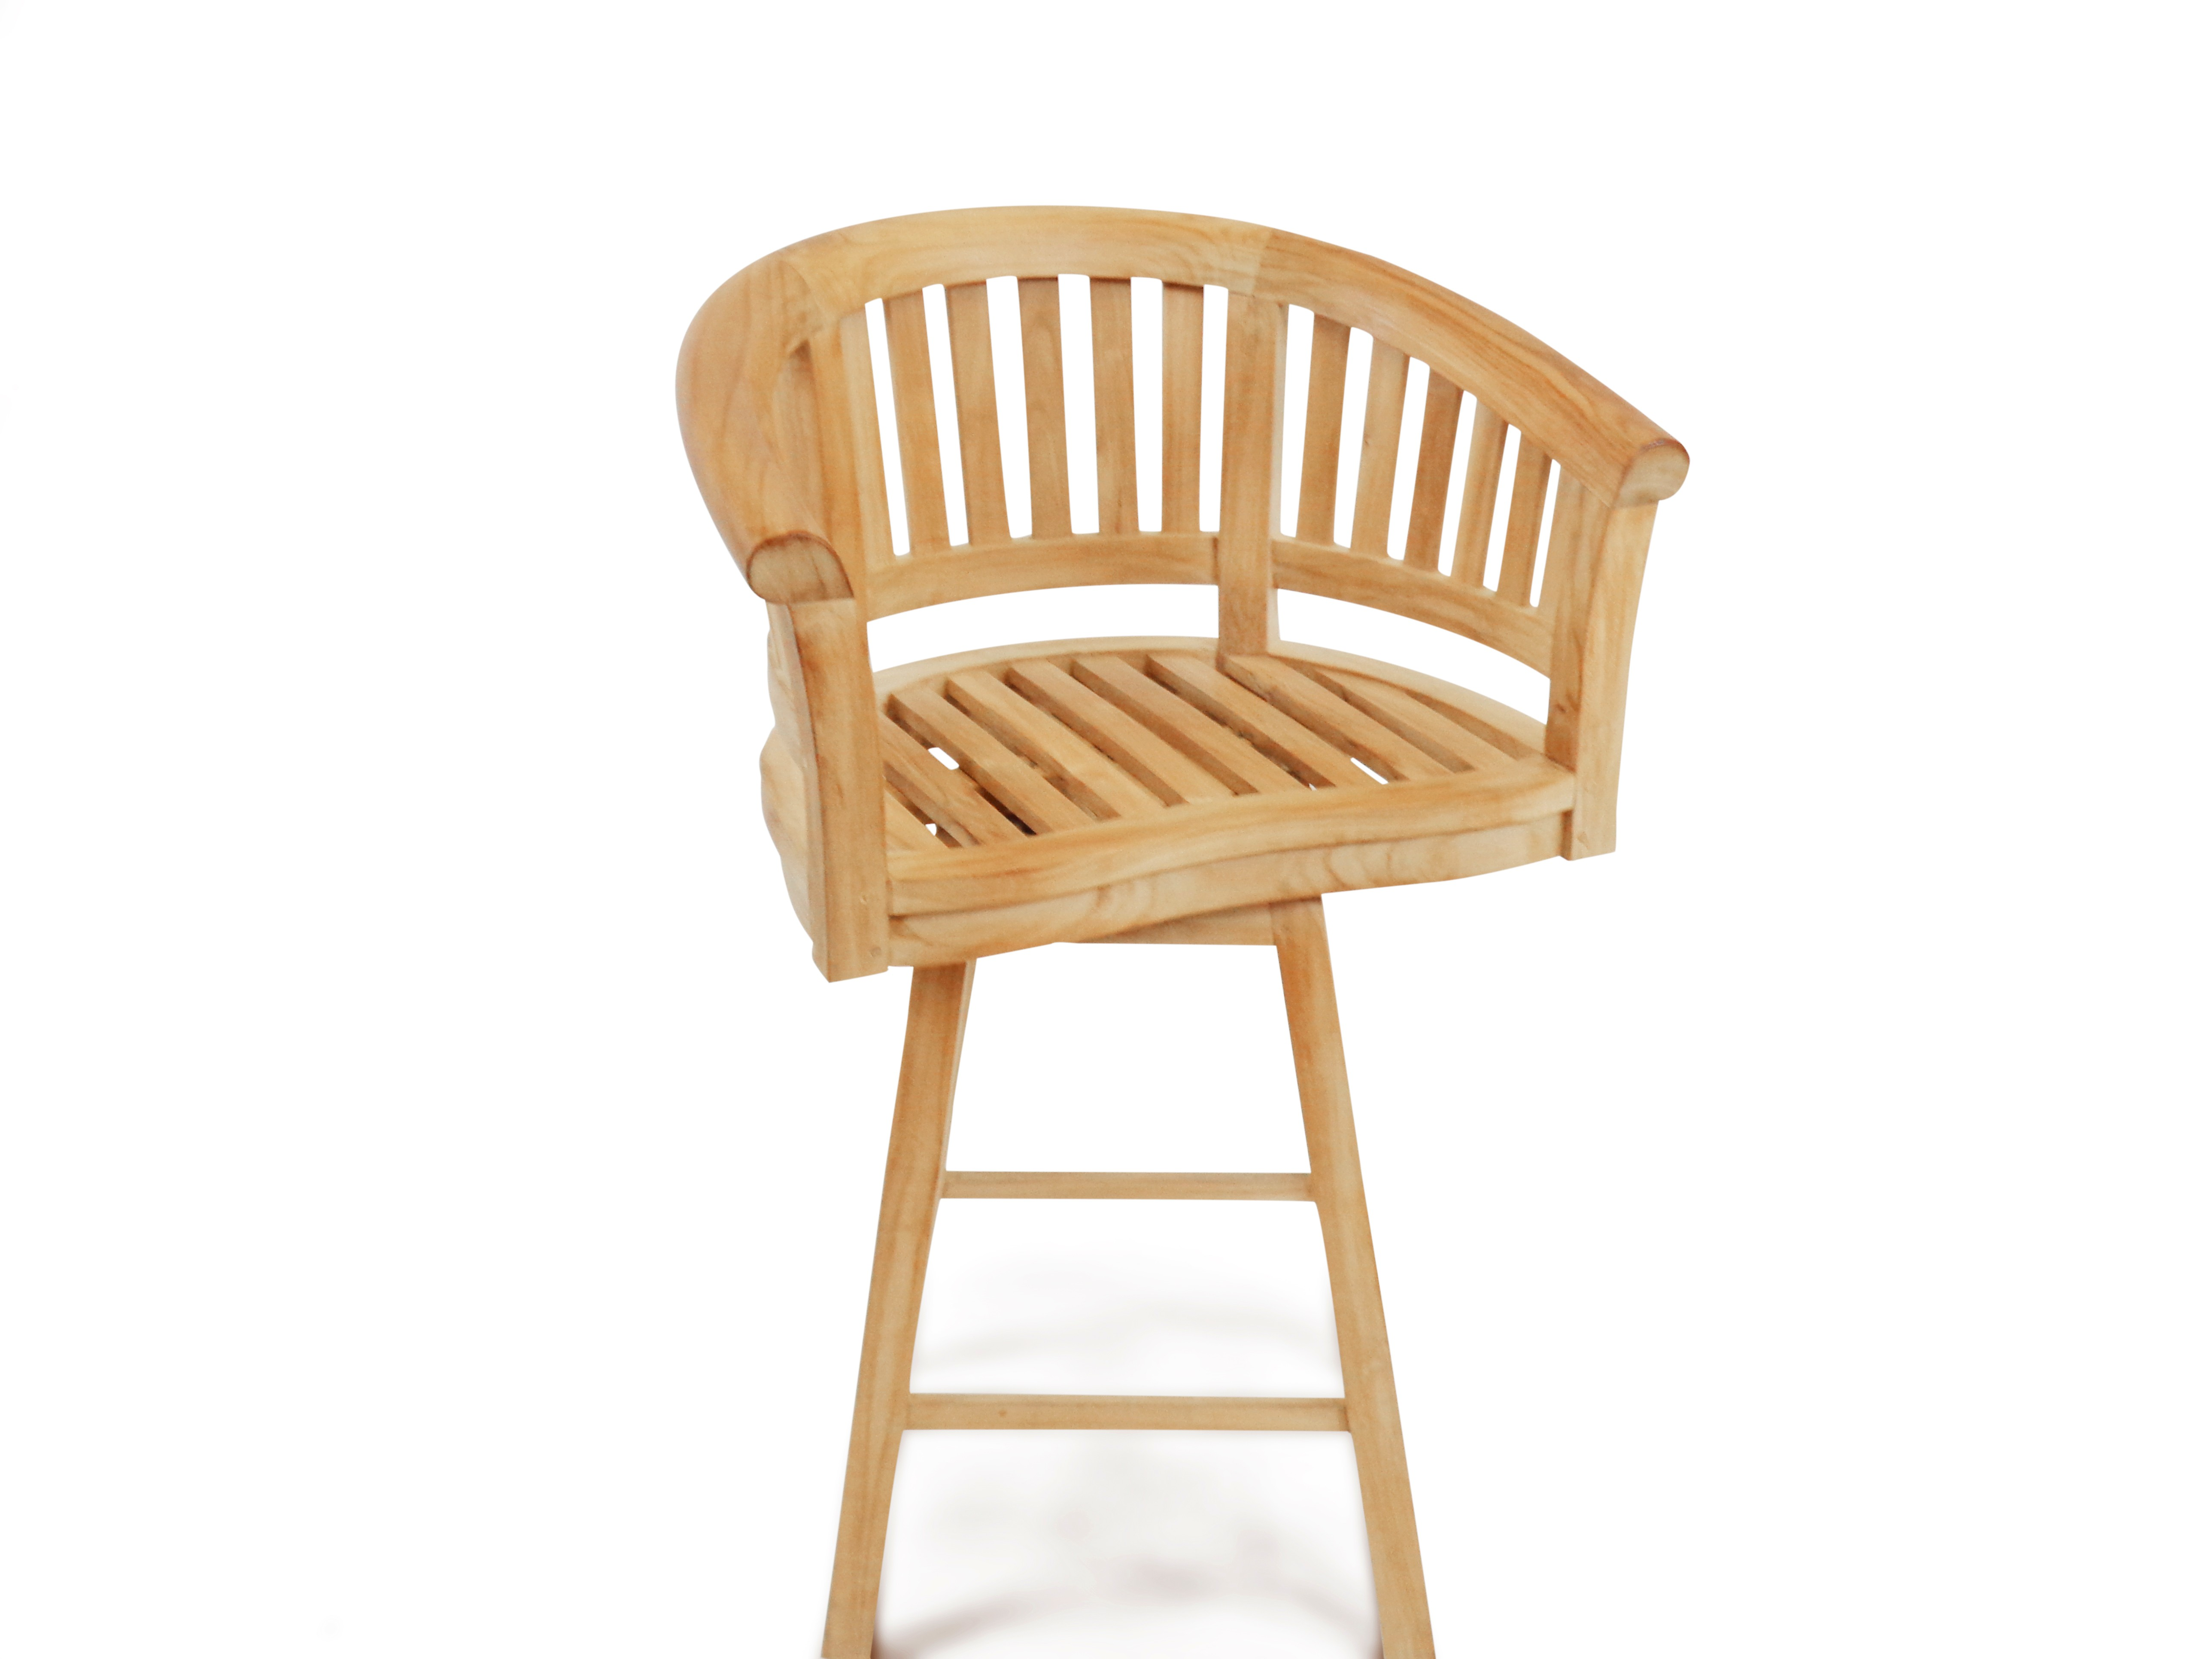 Kensington Swivel Curved Teak Arm Bar chair